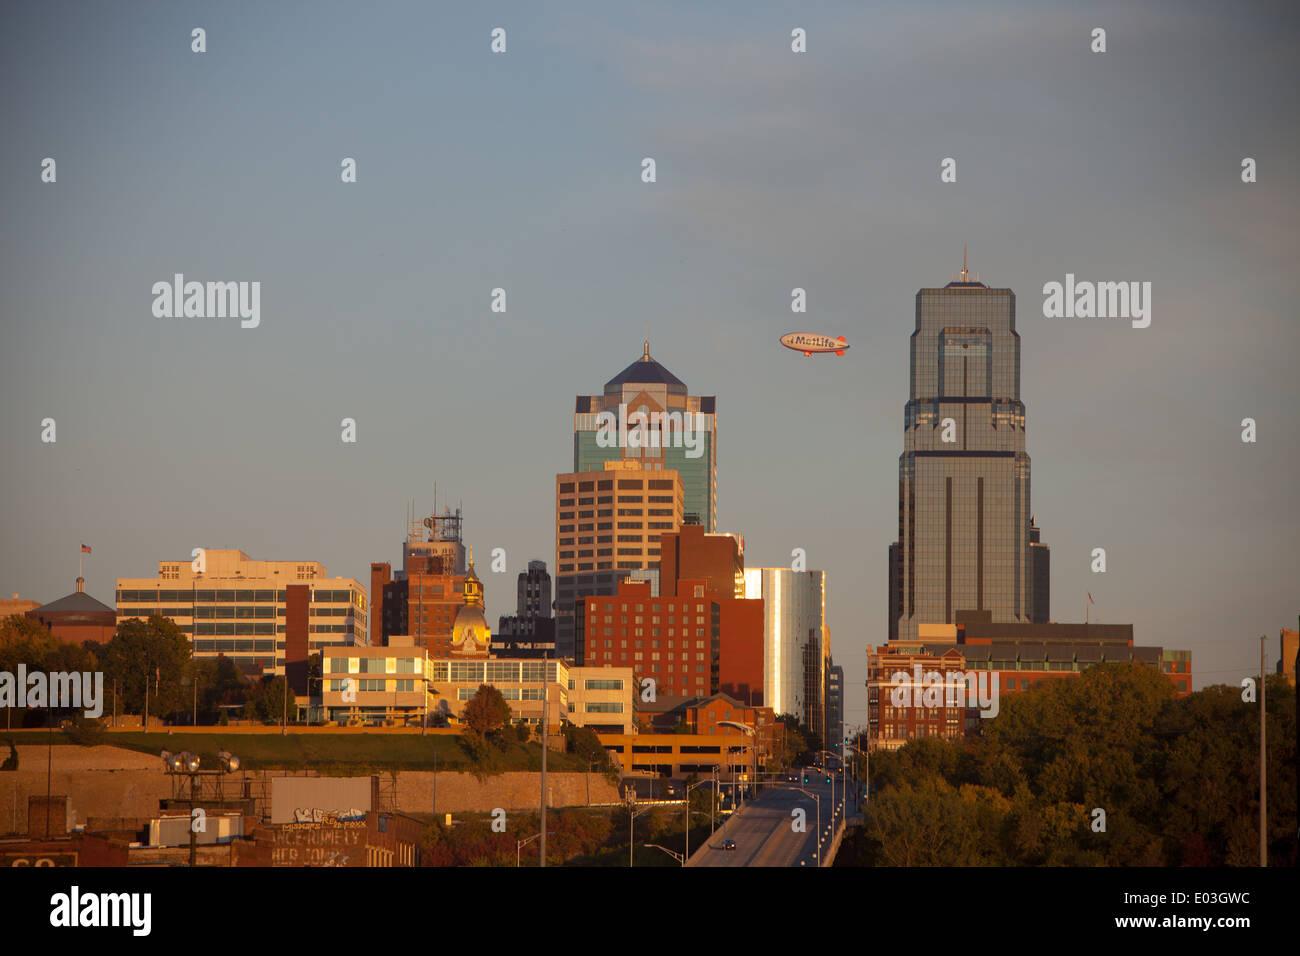 The Kansas City, MO skyline as a blimp soars high above. - Stock Image